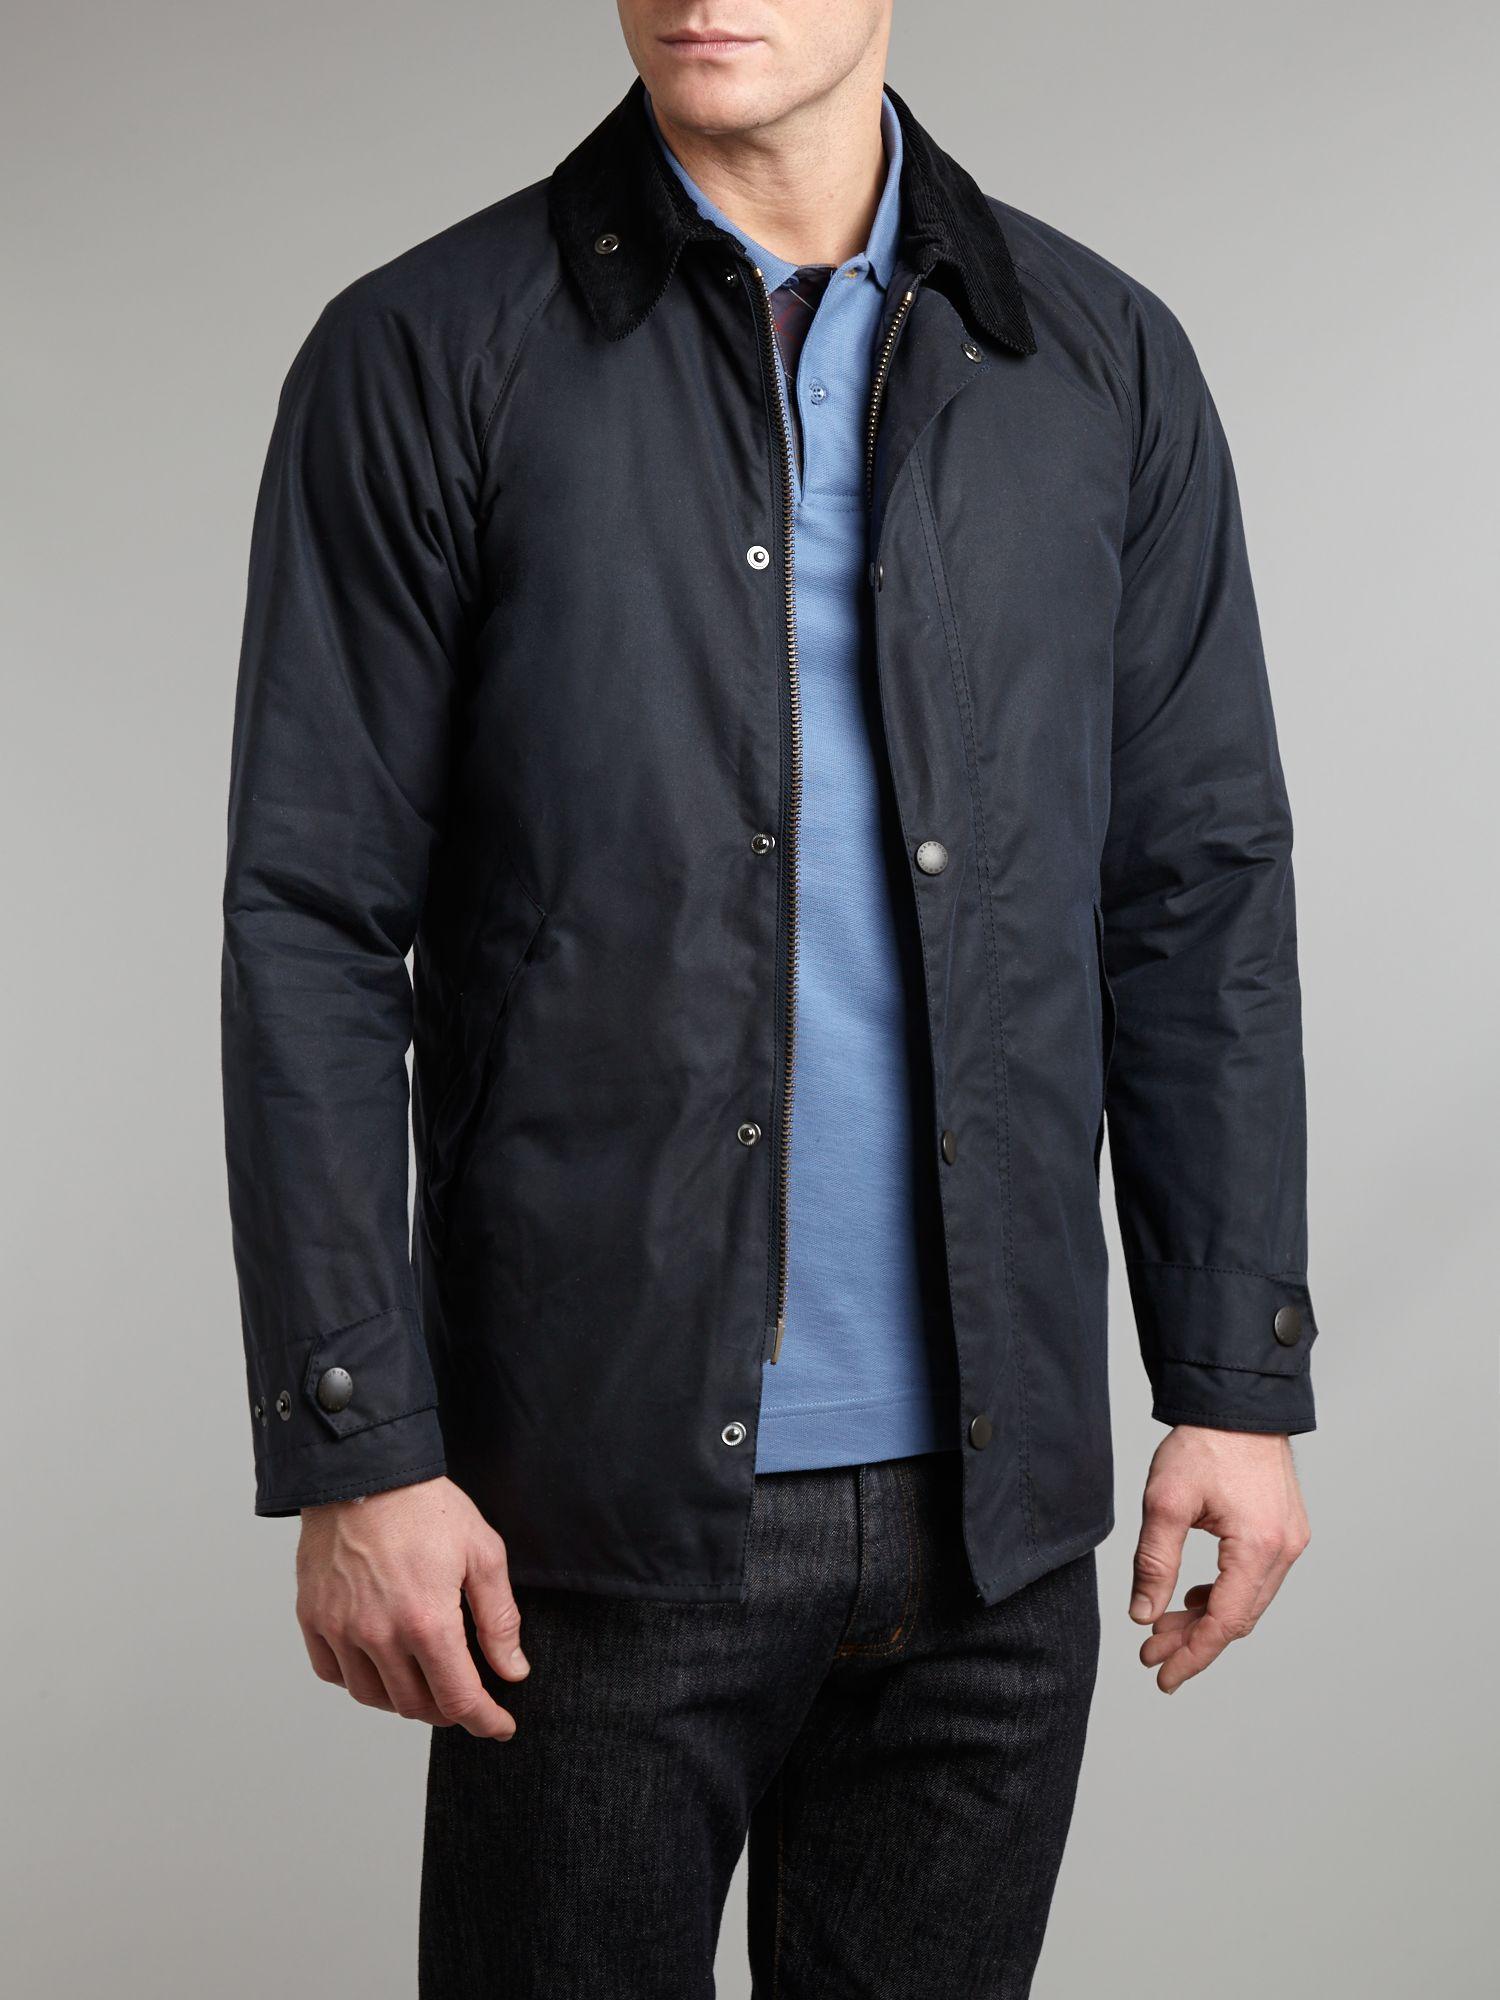 Barbour Wax Transport Jacket in Blue for Men